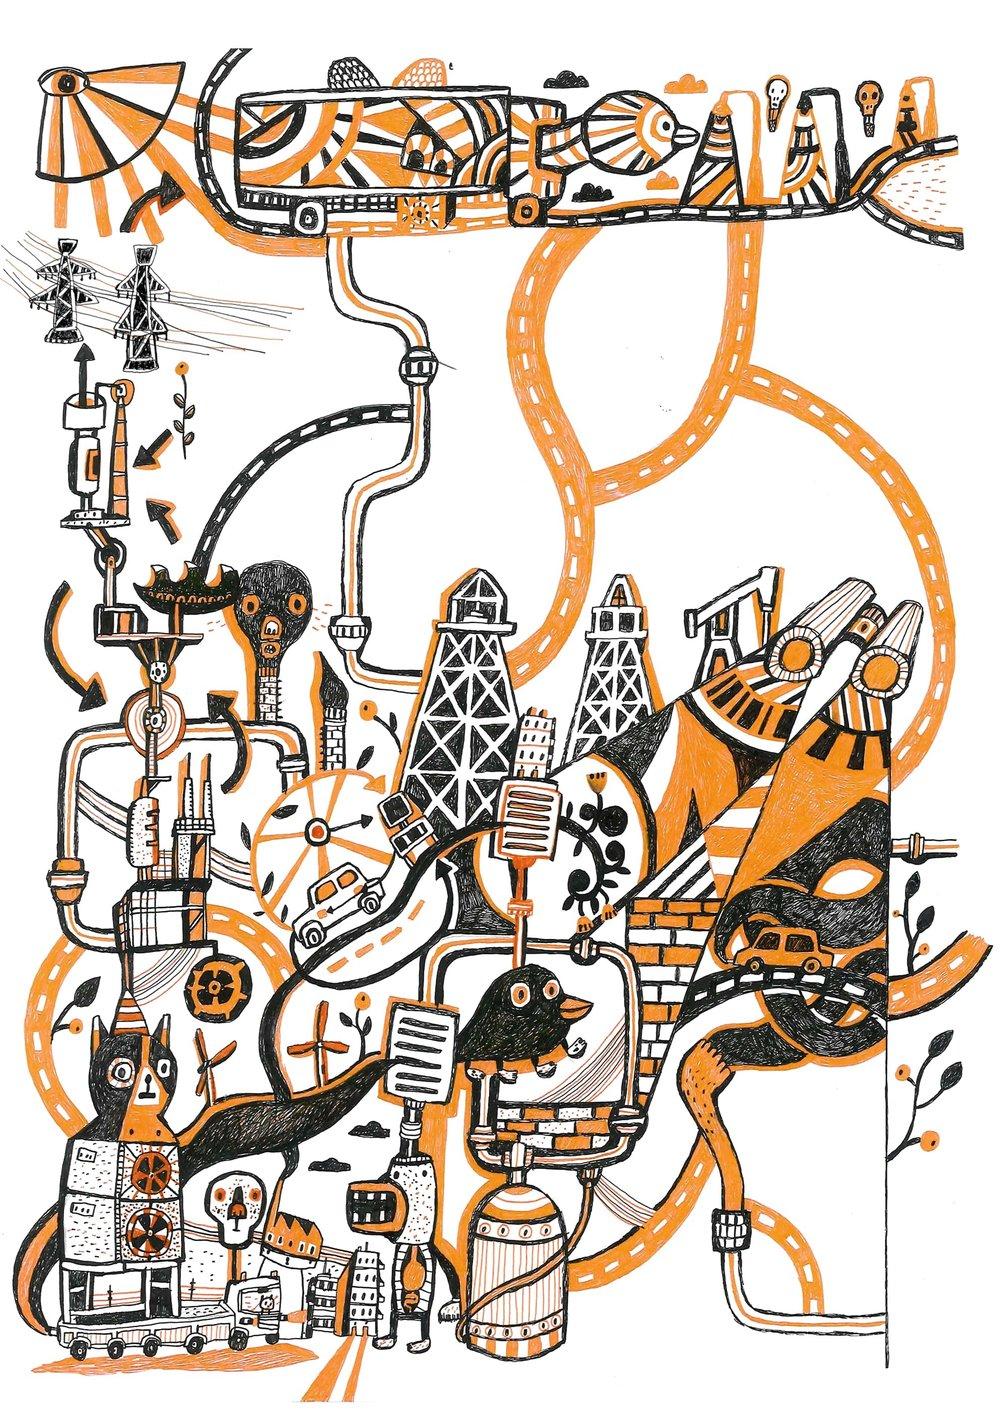 sociotechnicalFutures_illustration.jpg